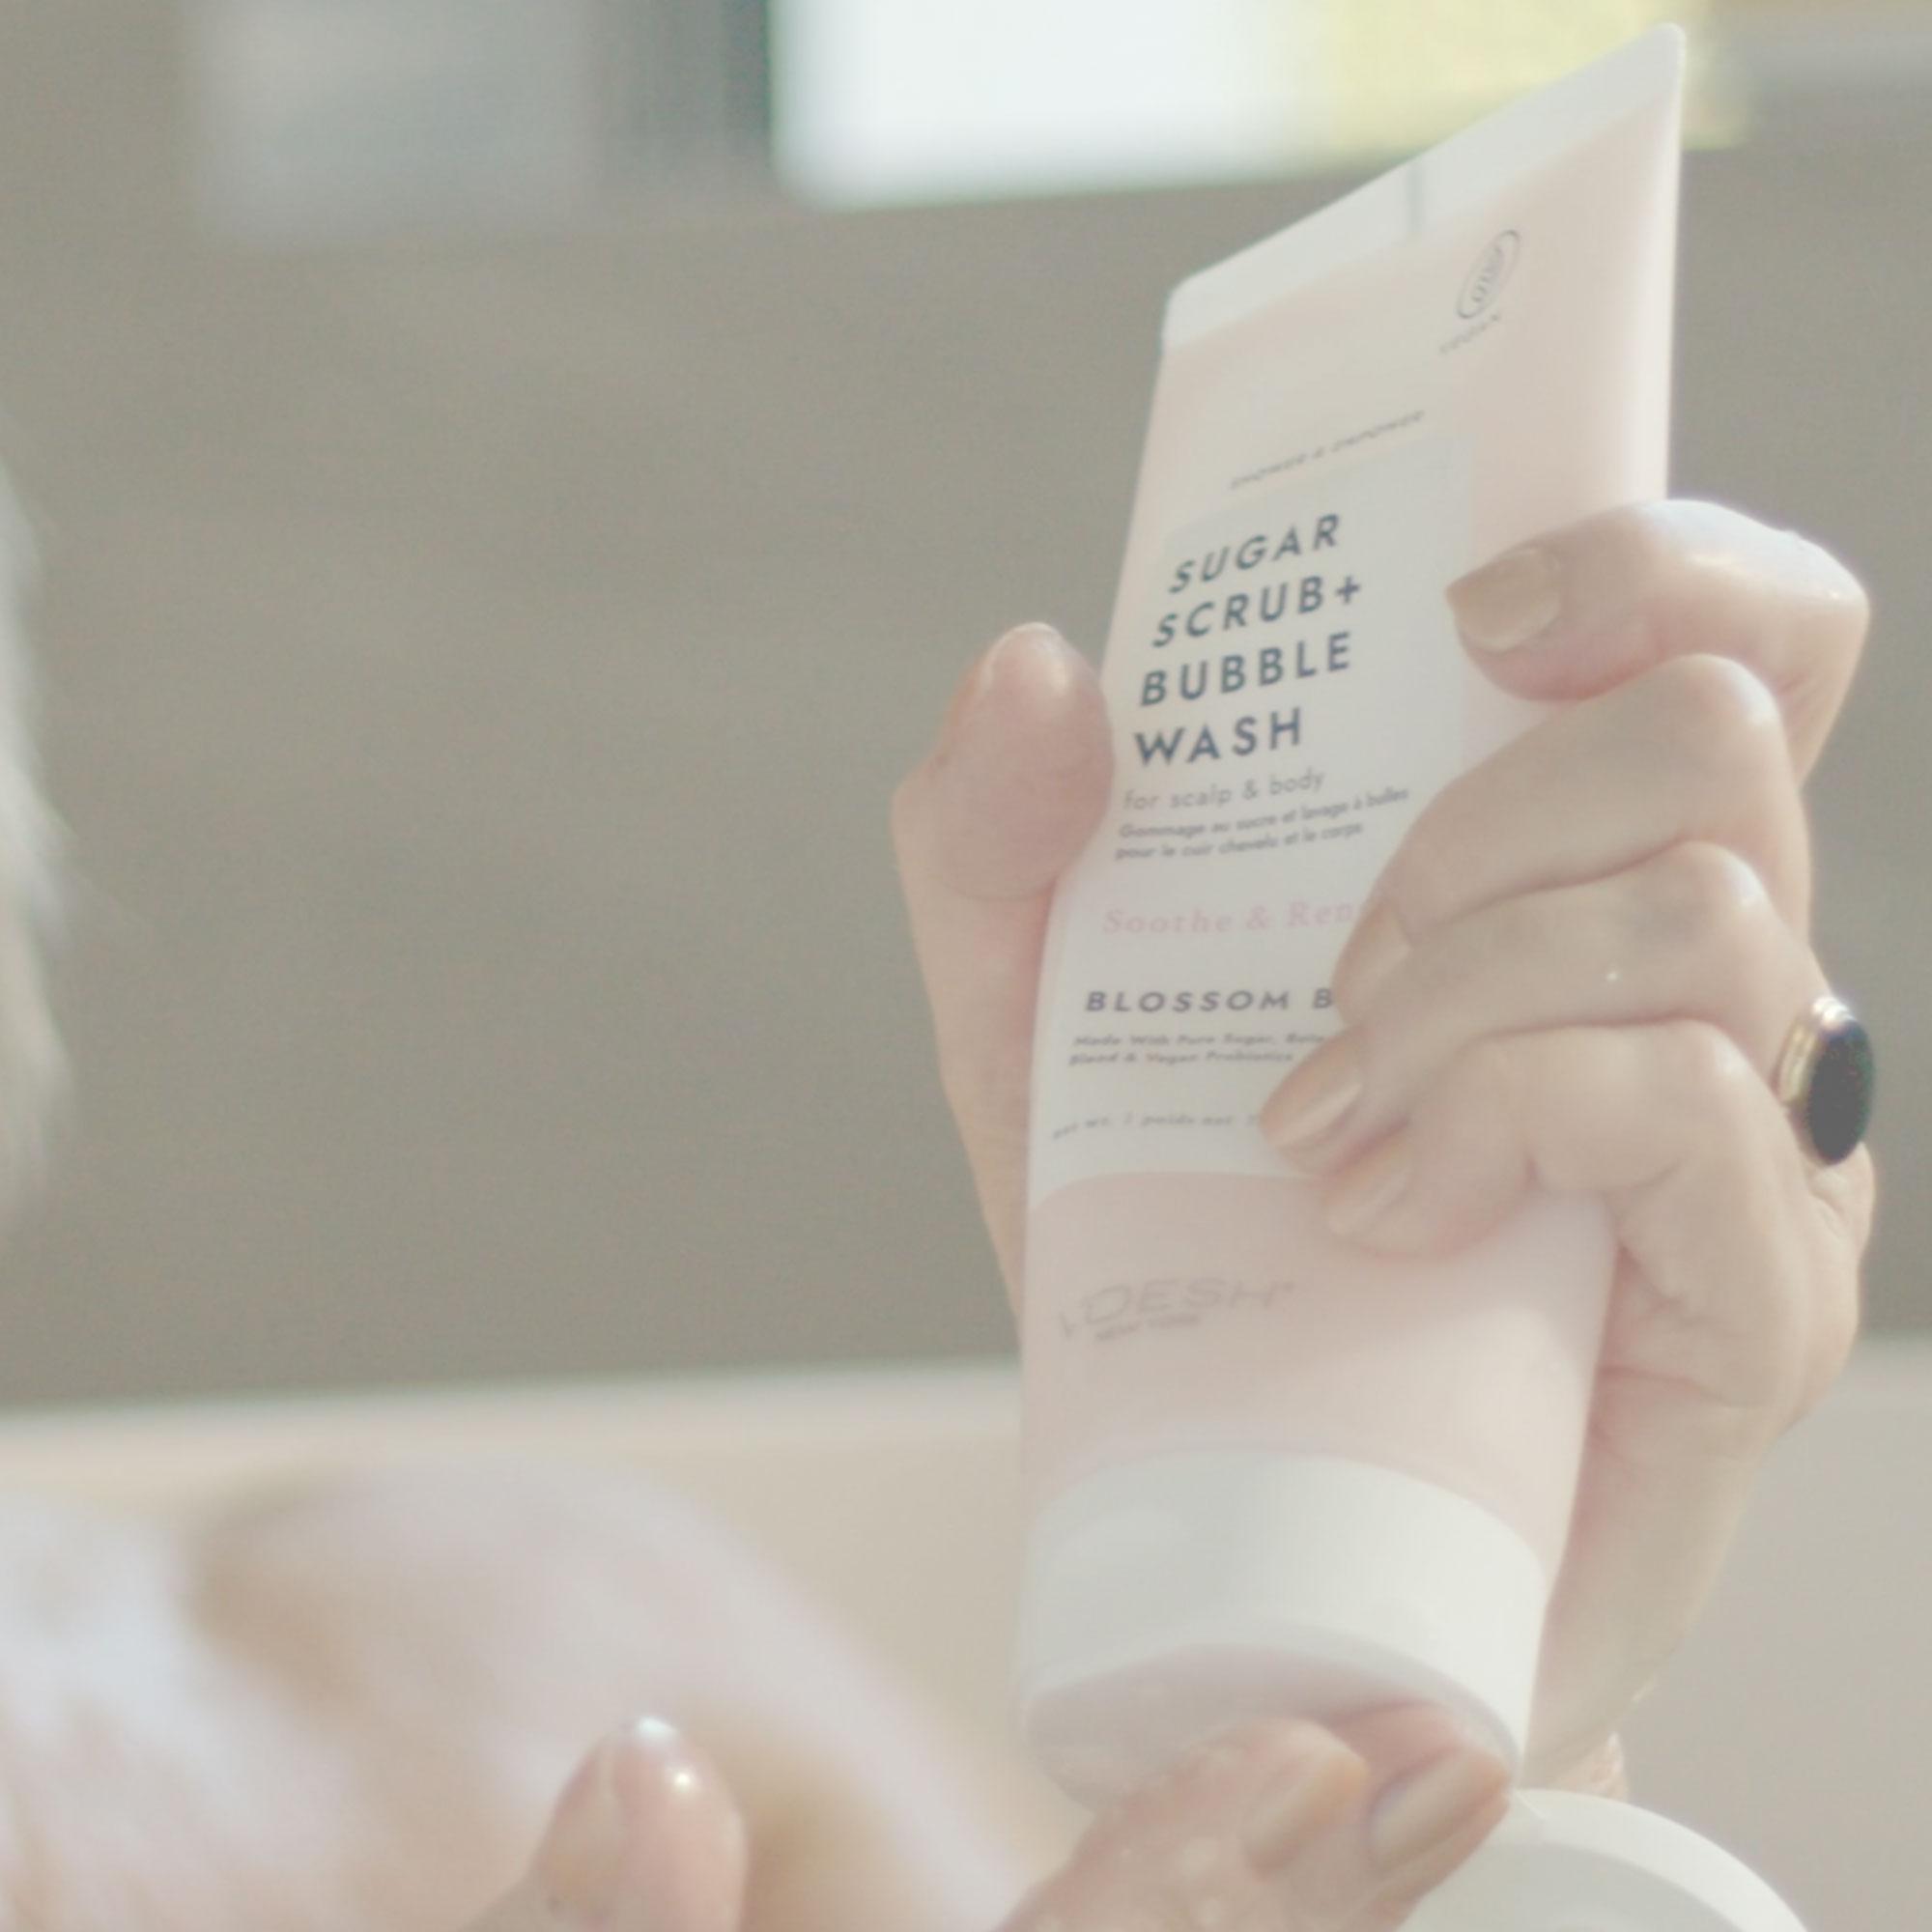 Blossom Bliss Sugar Scrub + Bubble Wash For Scalp & Body